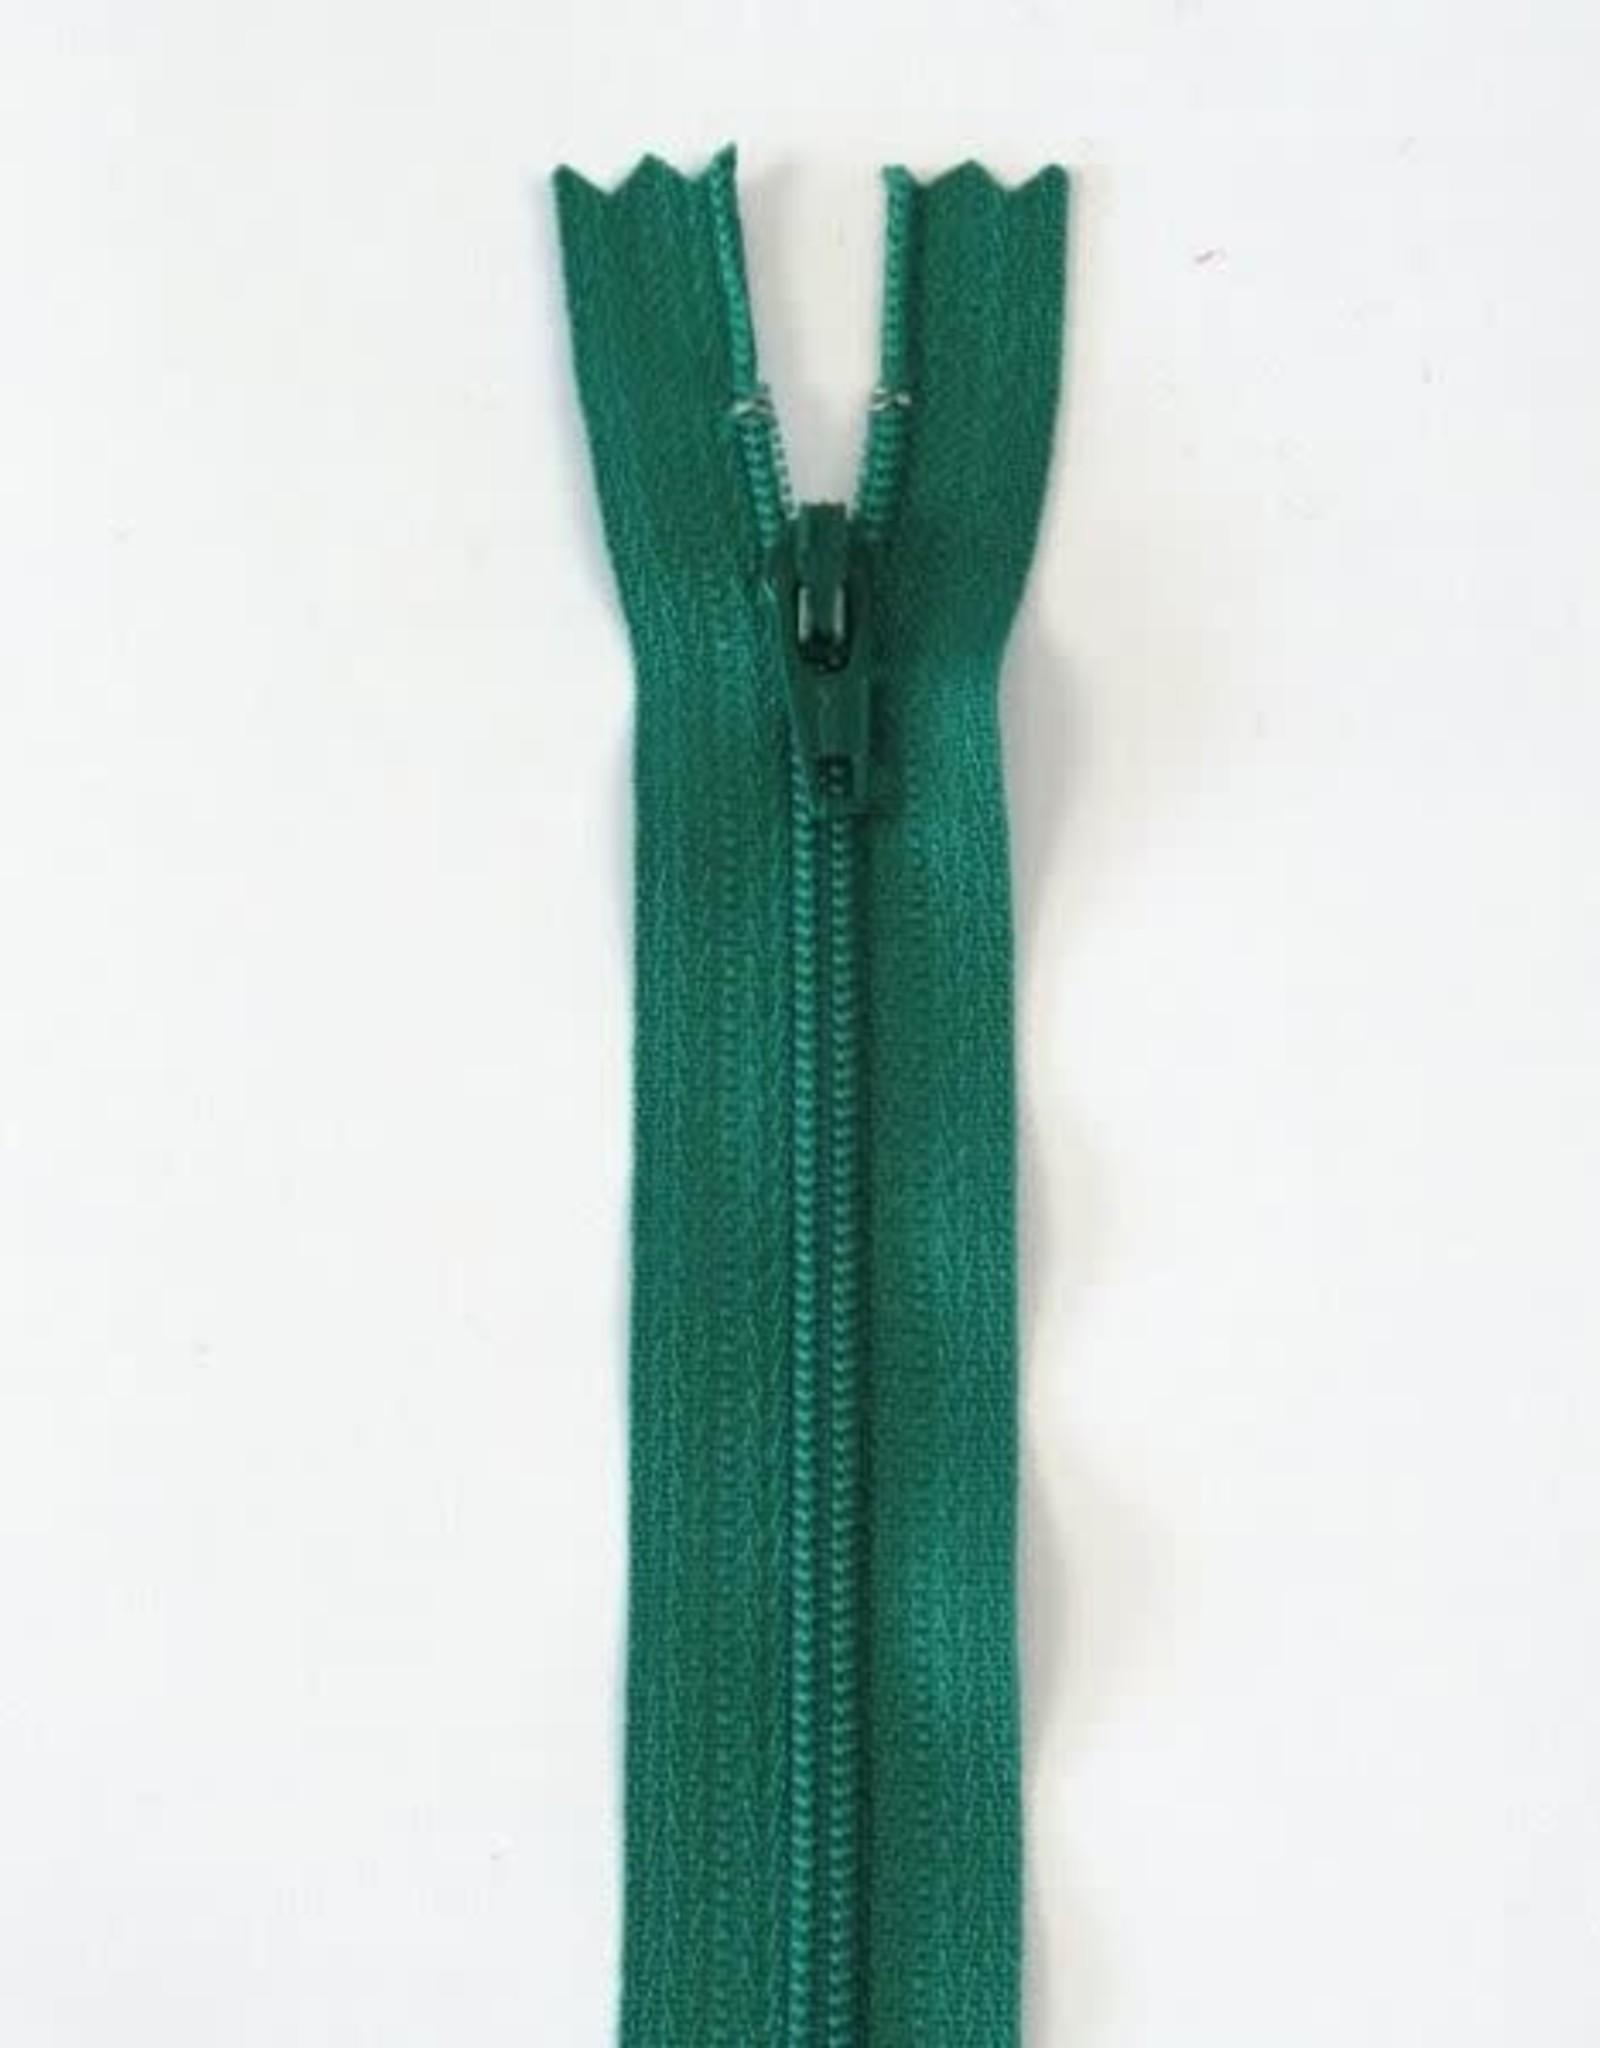 YKK Spiraalrits niet-DB 3mm grasgroen 540-25cm